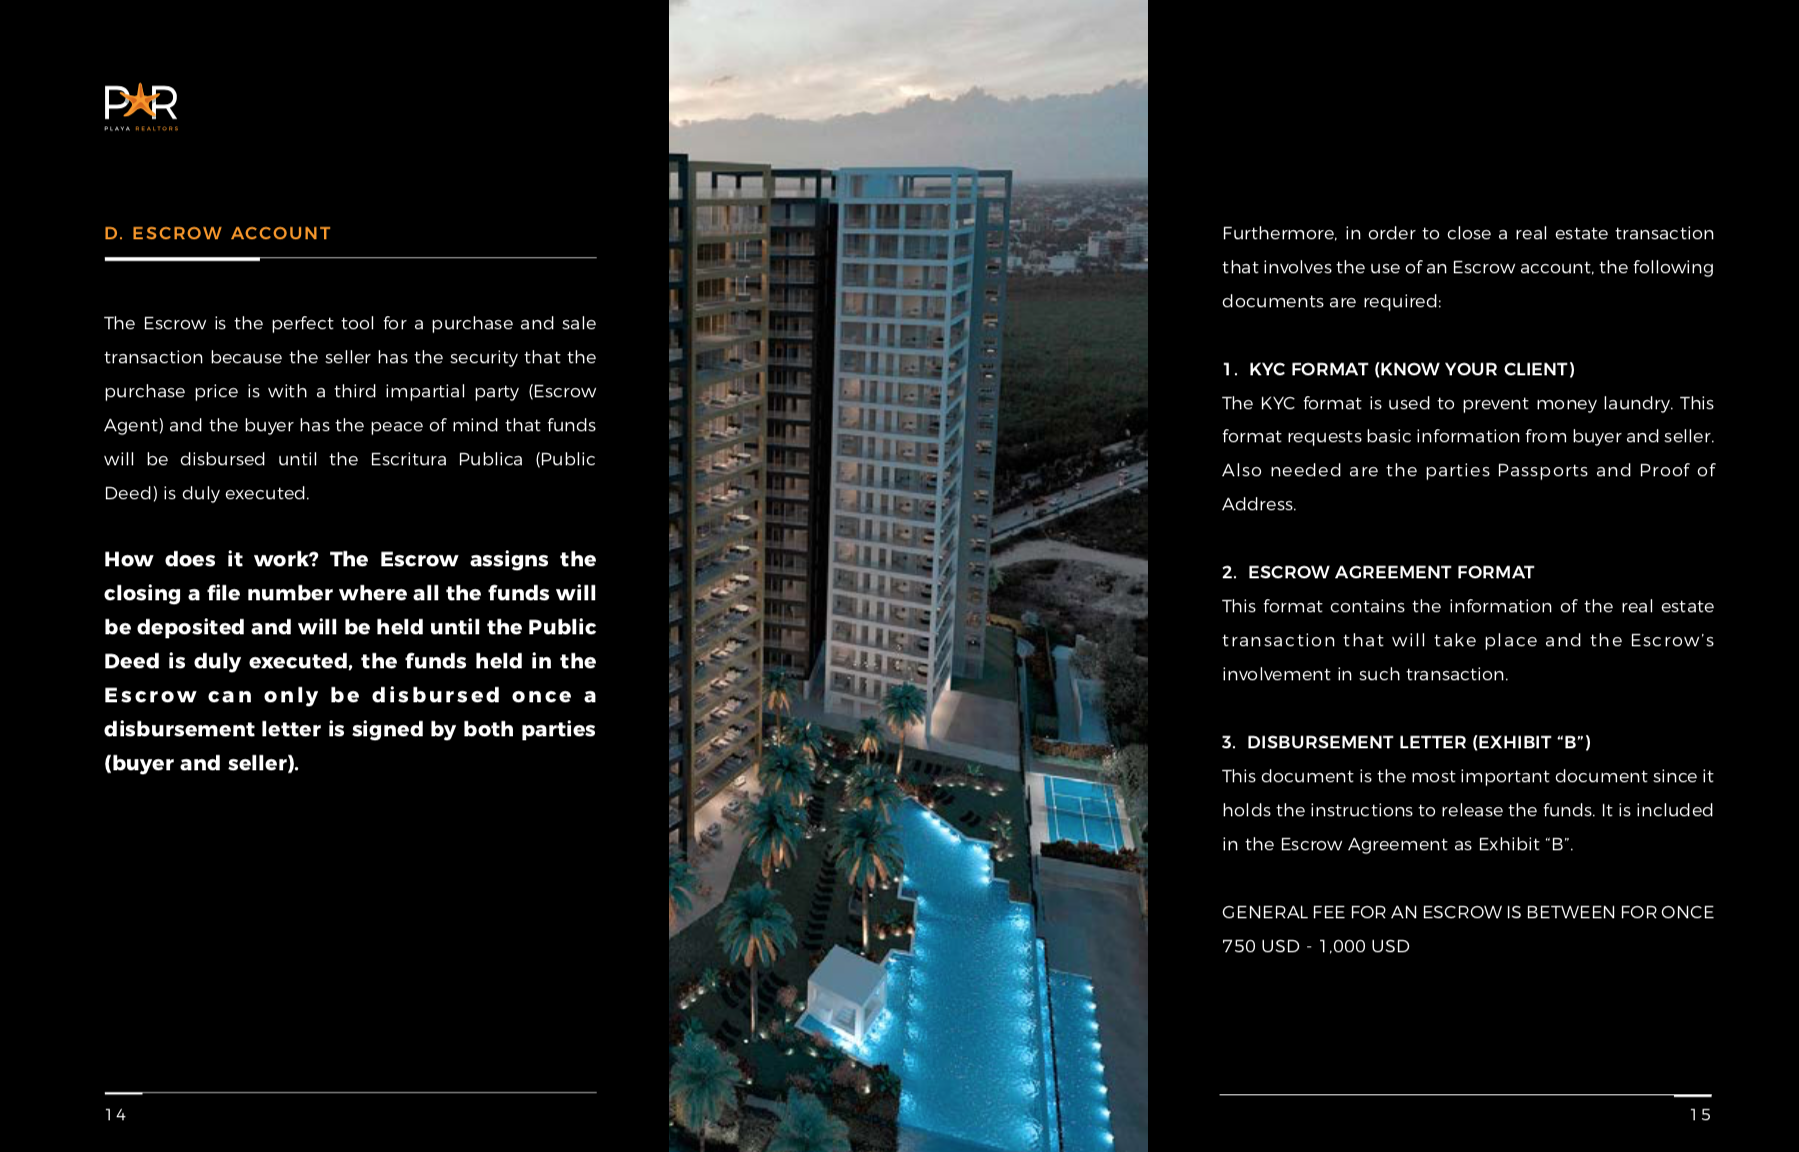 Marketing-Digital-Playa-Realtors-Riviera-Maya